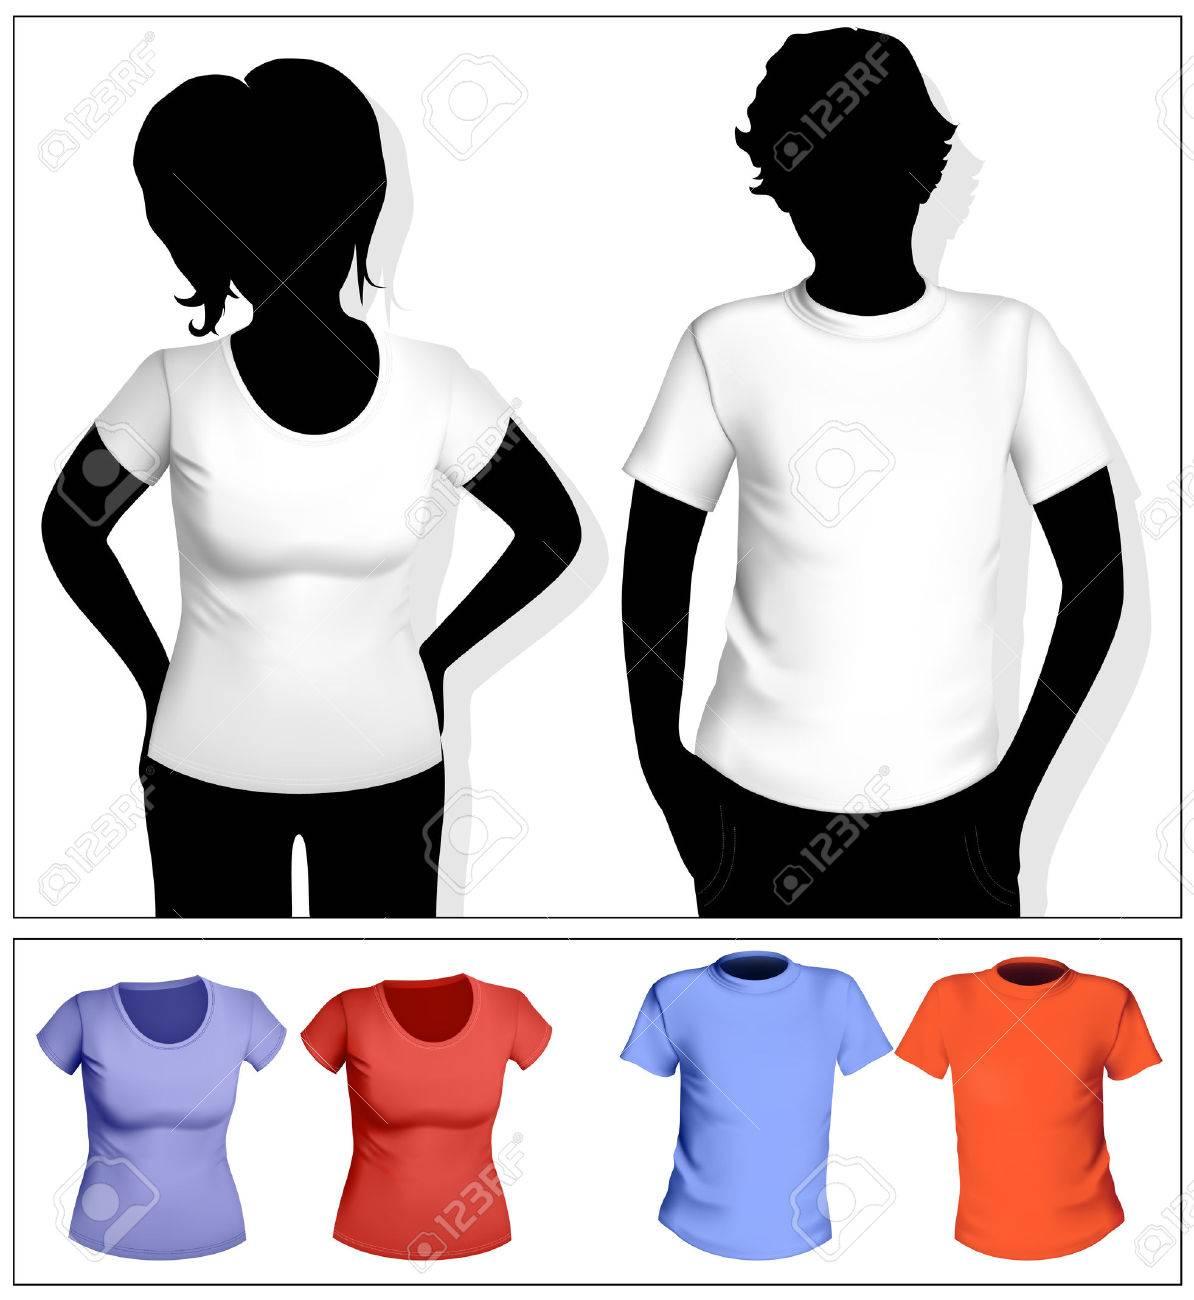 Zazzle T Shirt Template ✓ Istriku T Shirt